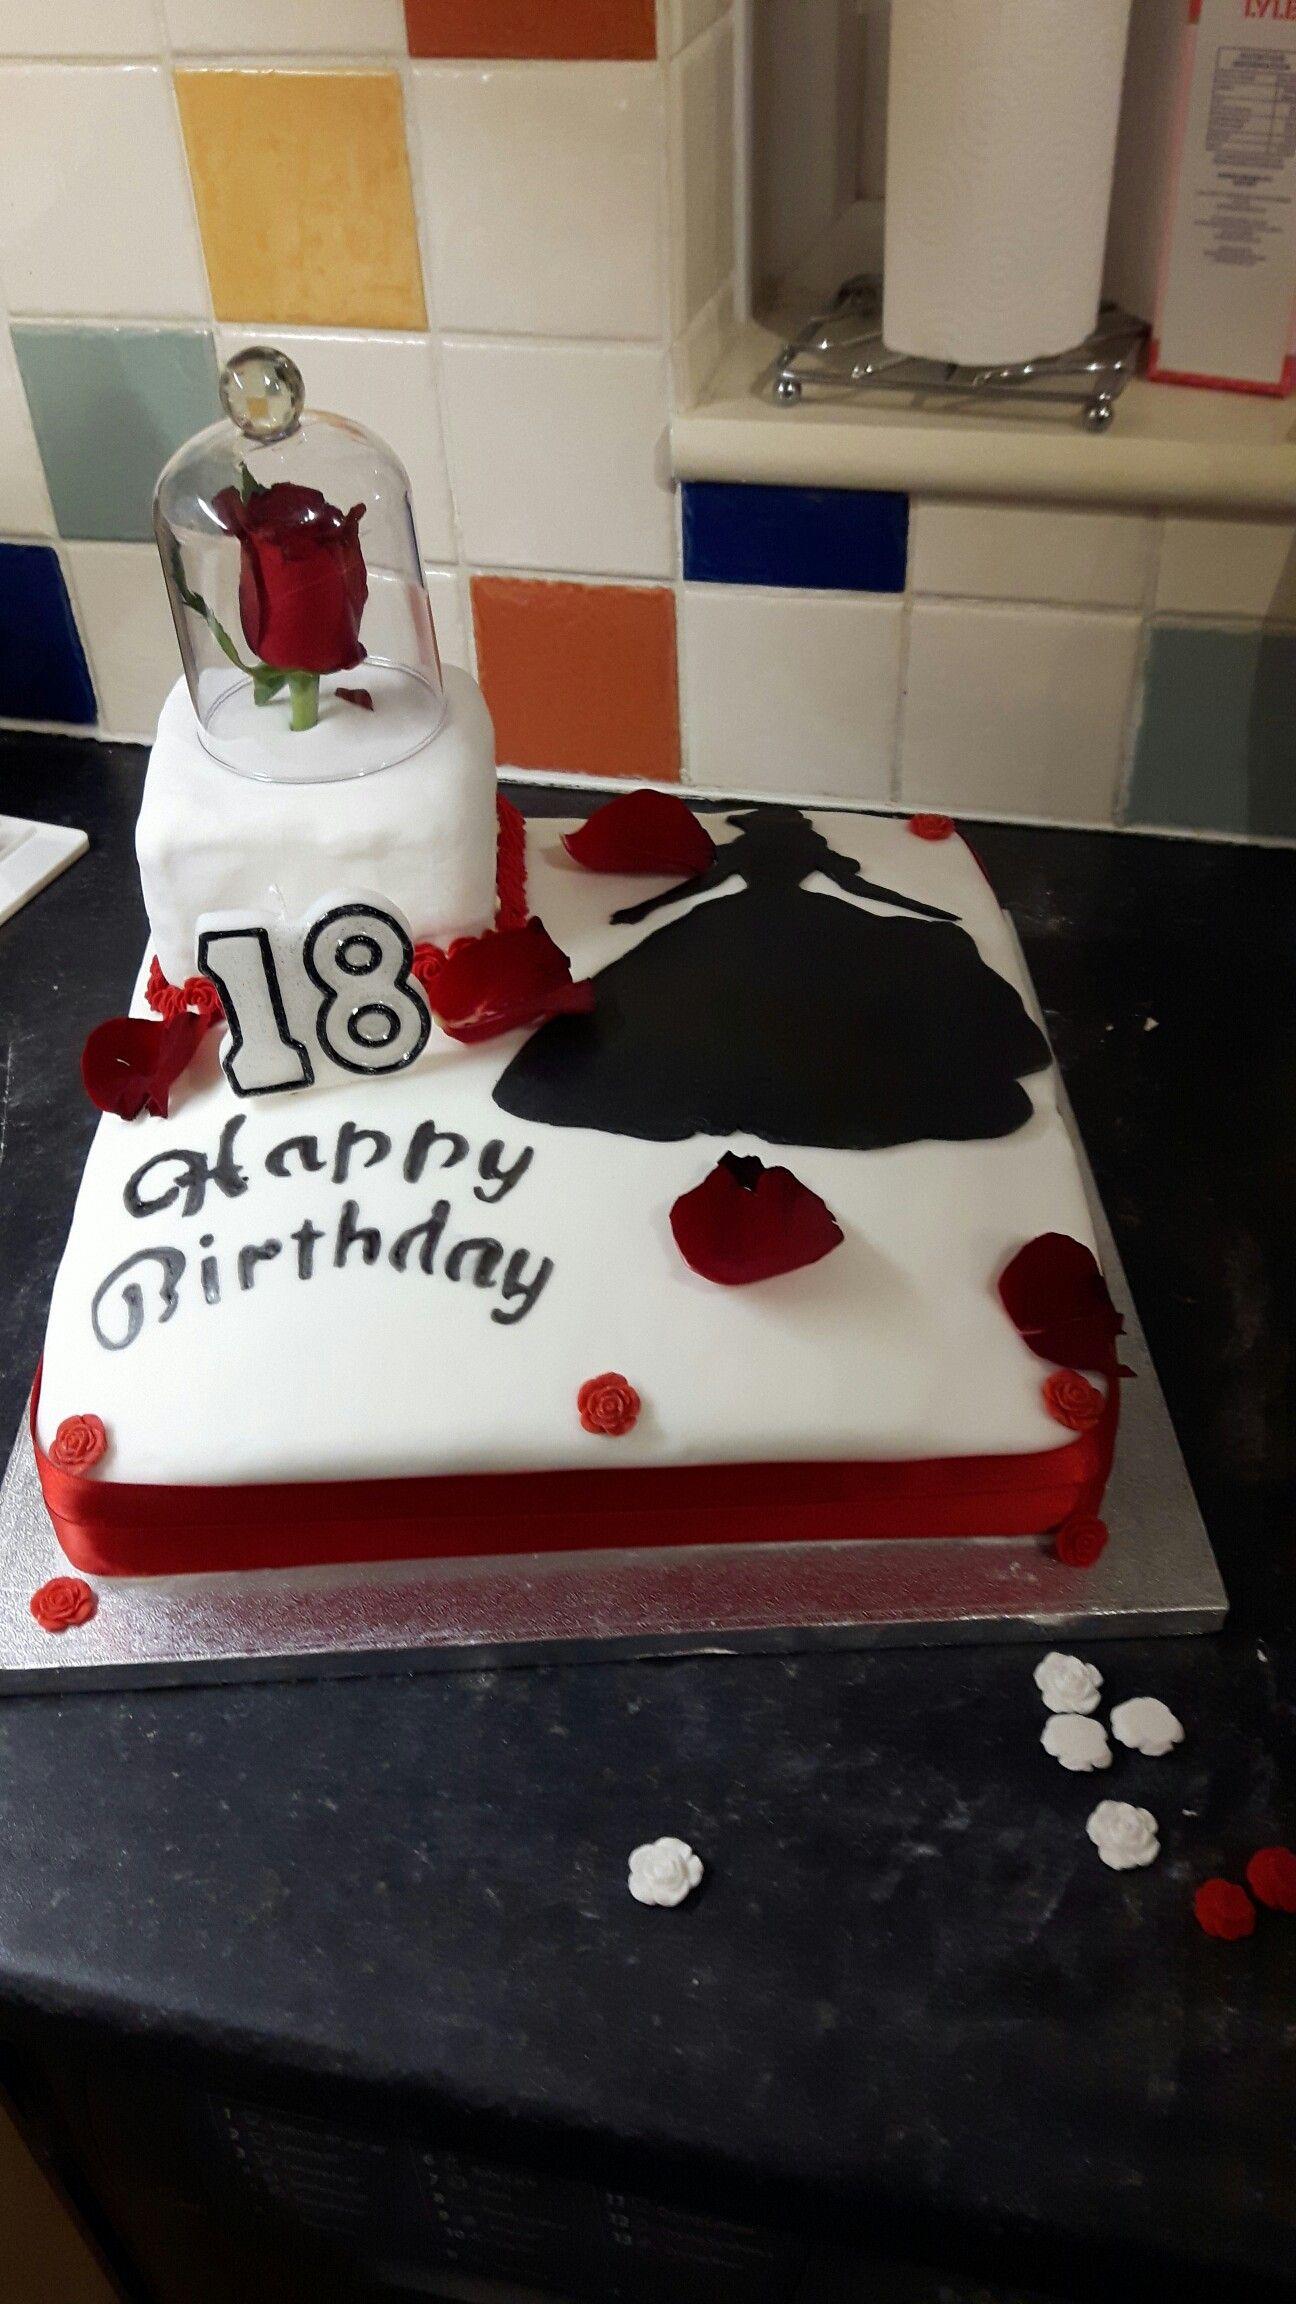 Belle birthday cake My Cakes Pinterest Birthday cakes and Cake